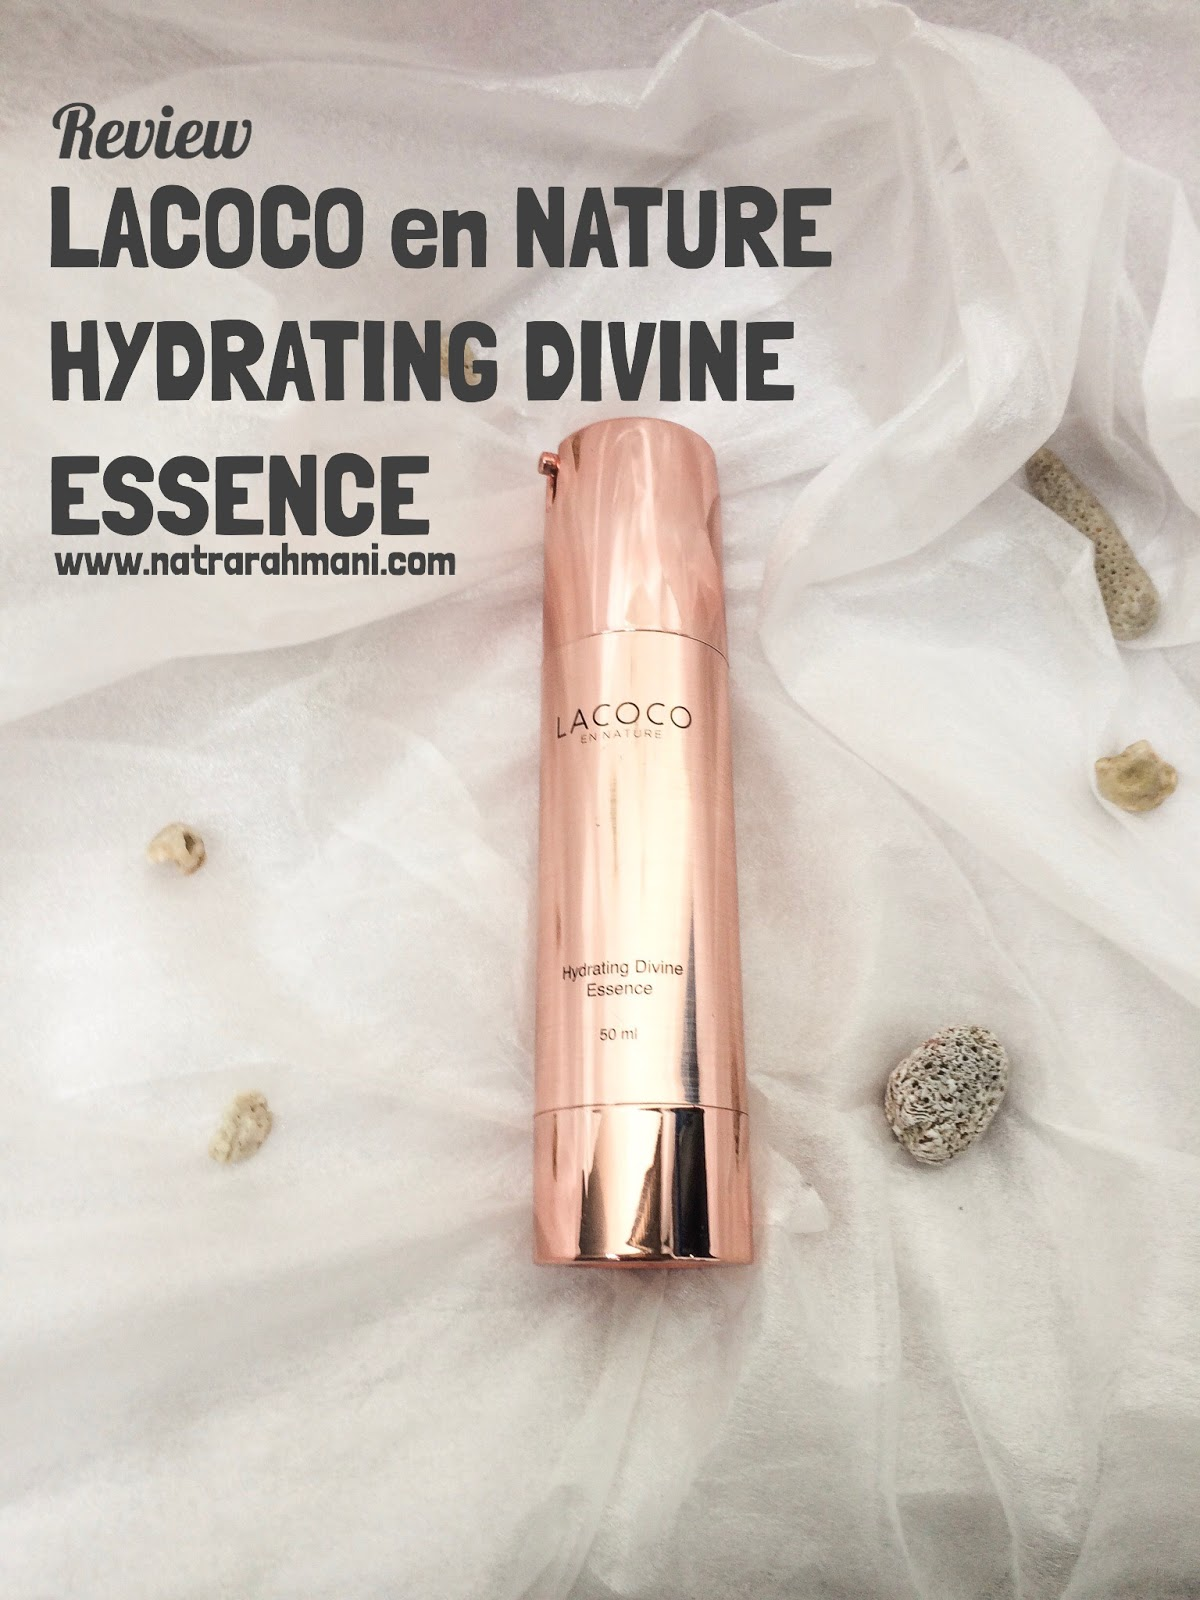 lacoco-en-nature-hydrating-divine-essence-natrarahmani